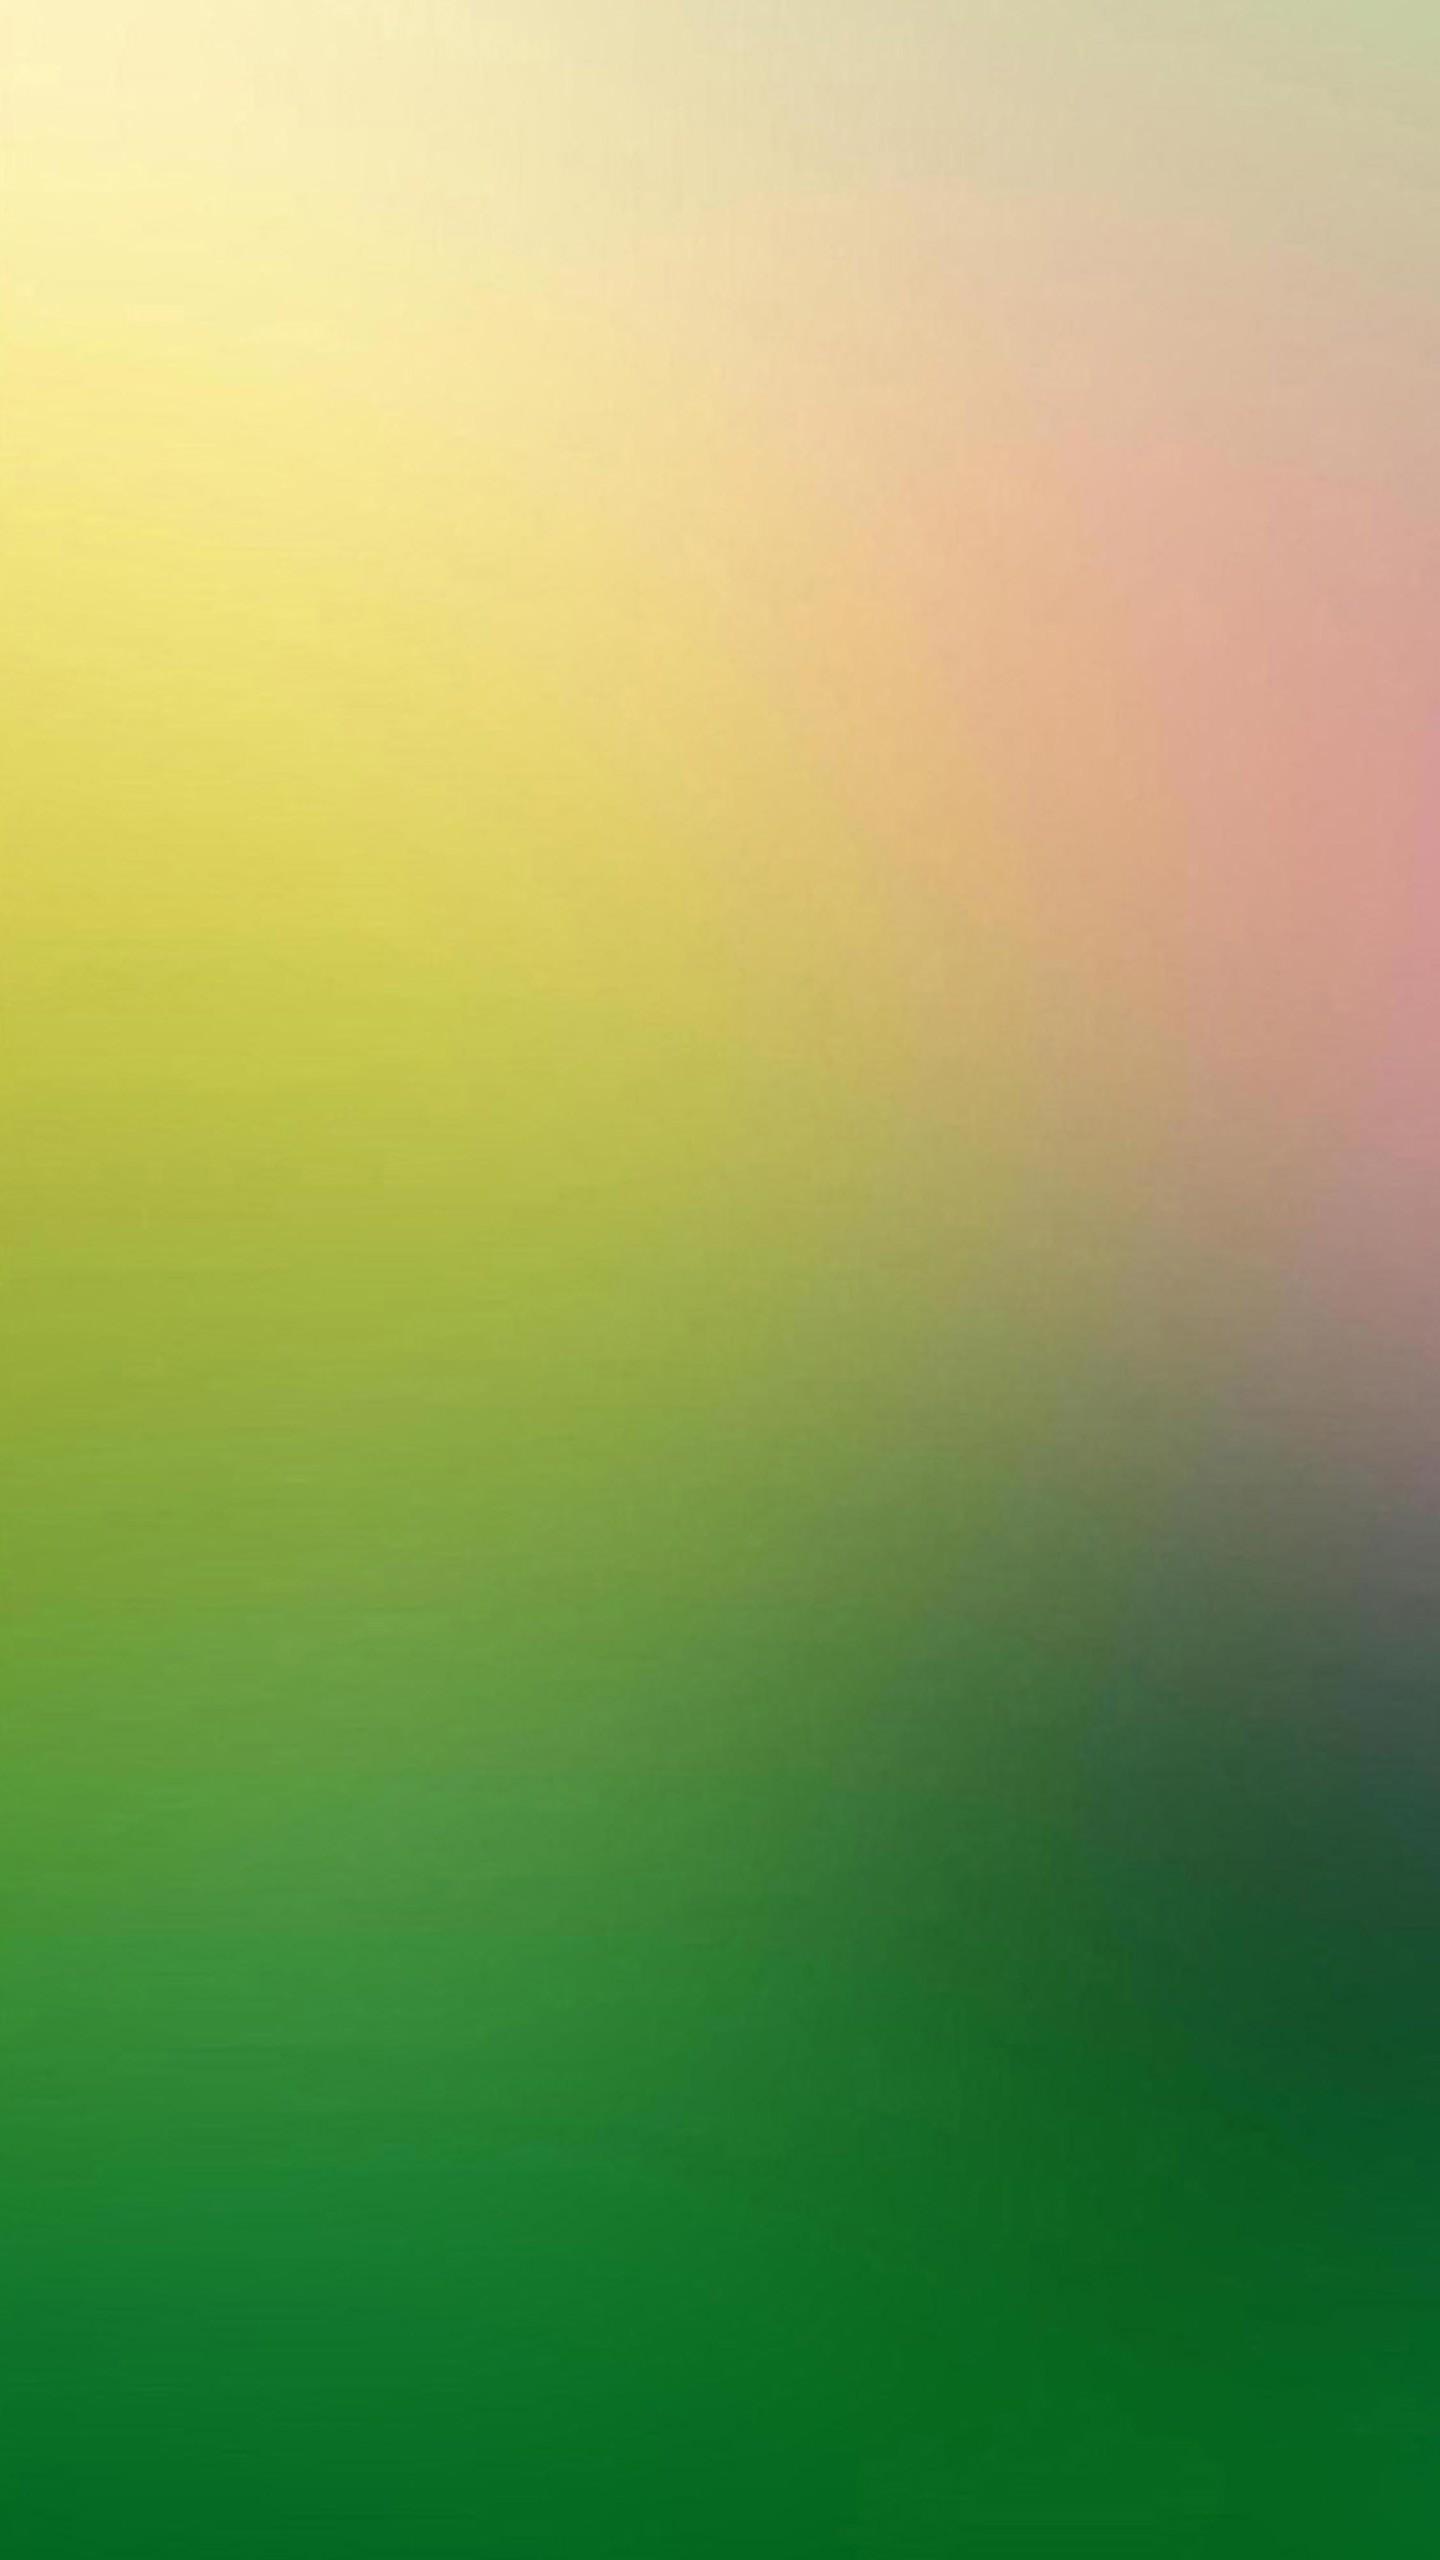 green gradient background  u00b7 u2460 download free stunning high